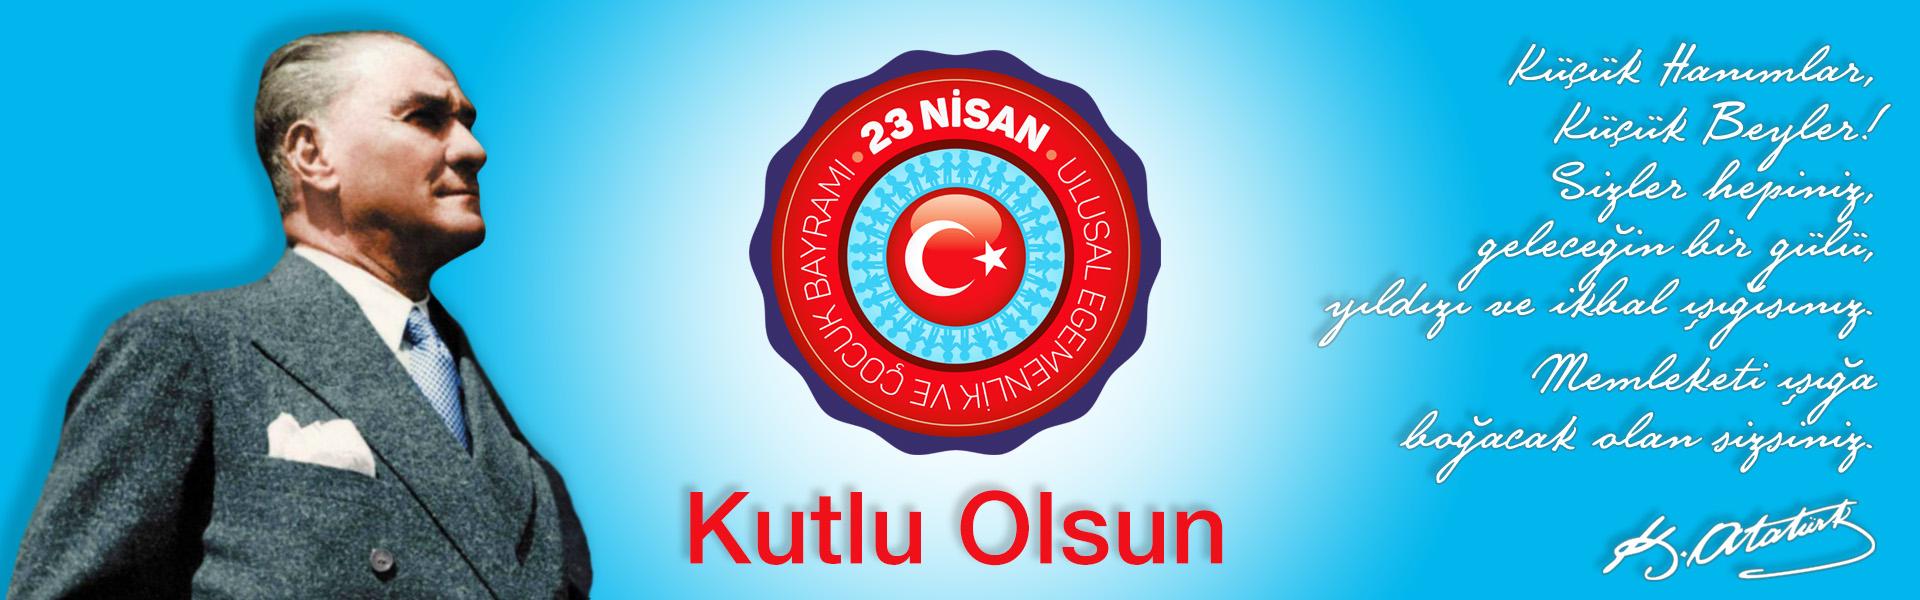 slider 23 nisan